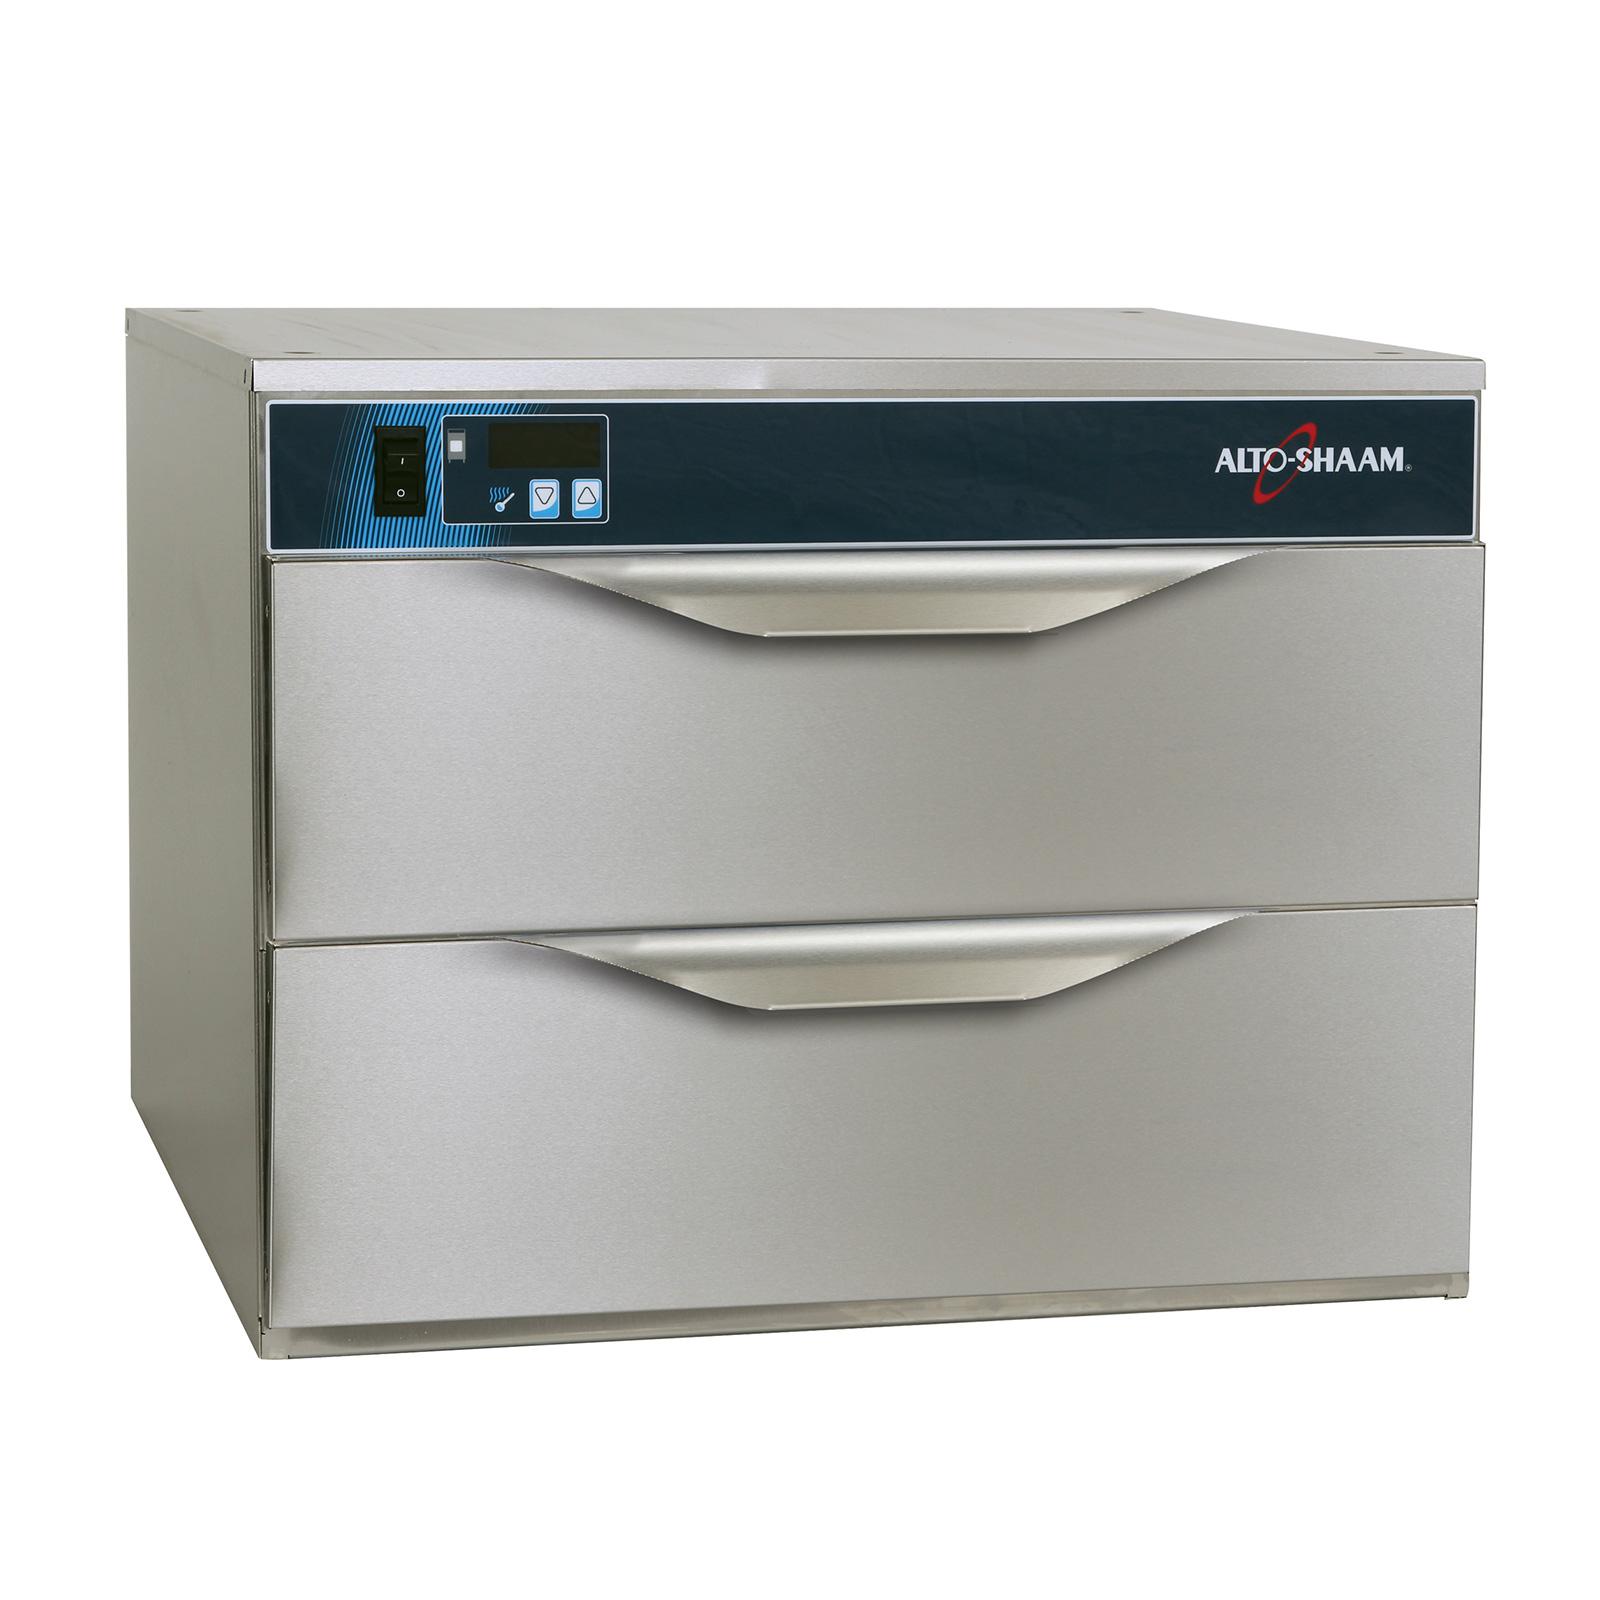 Alto-Shaam 500-2D-QSMEA warming drawer, free standing